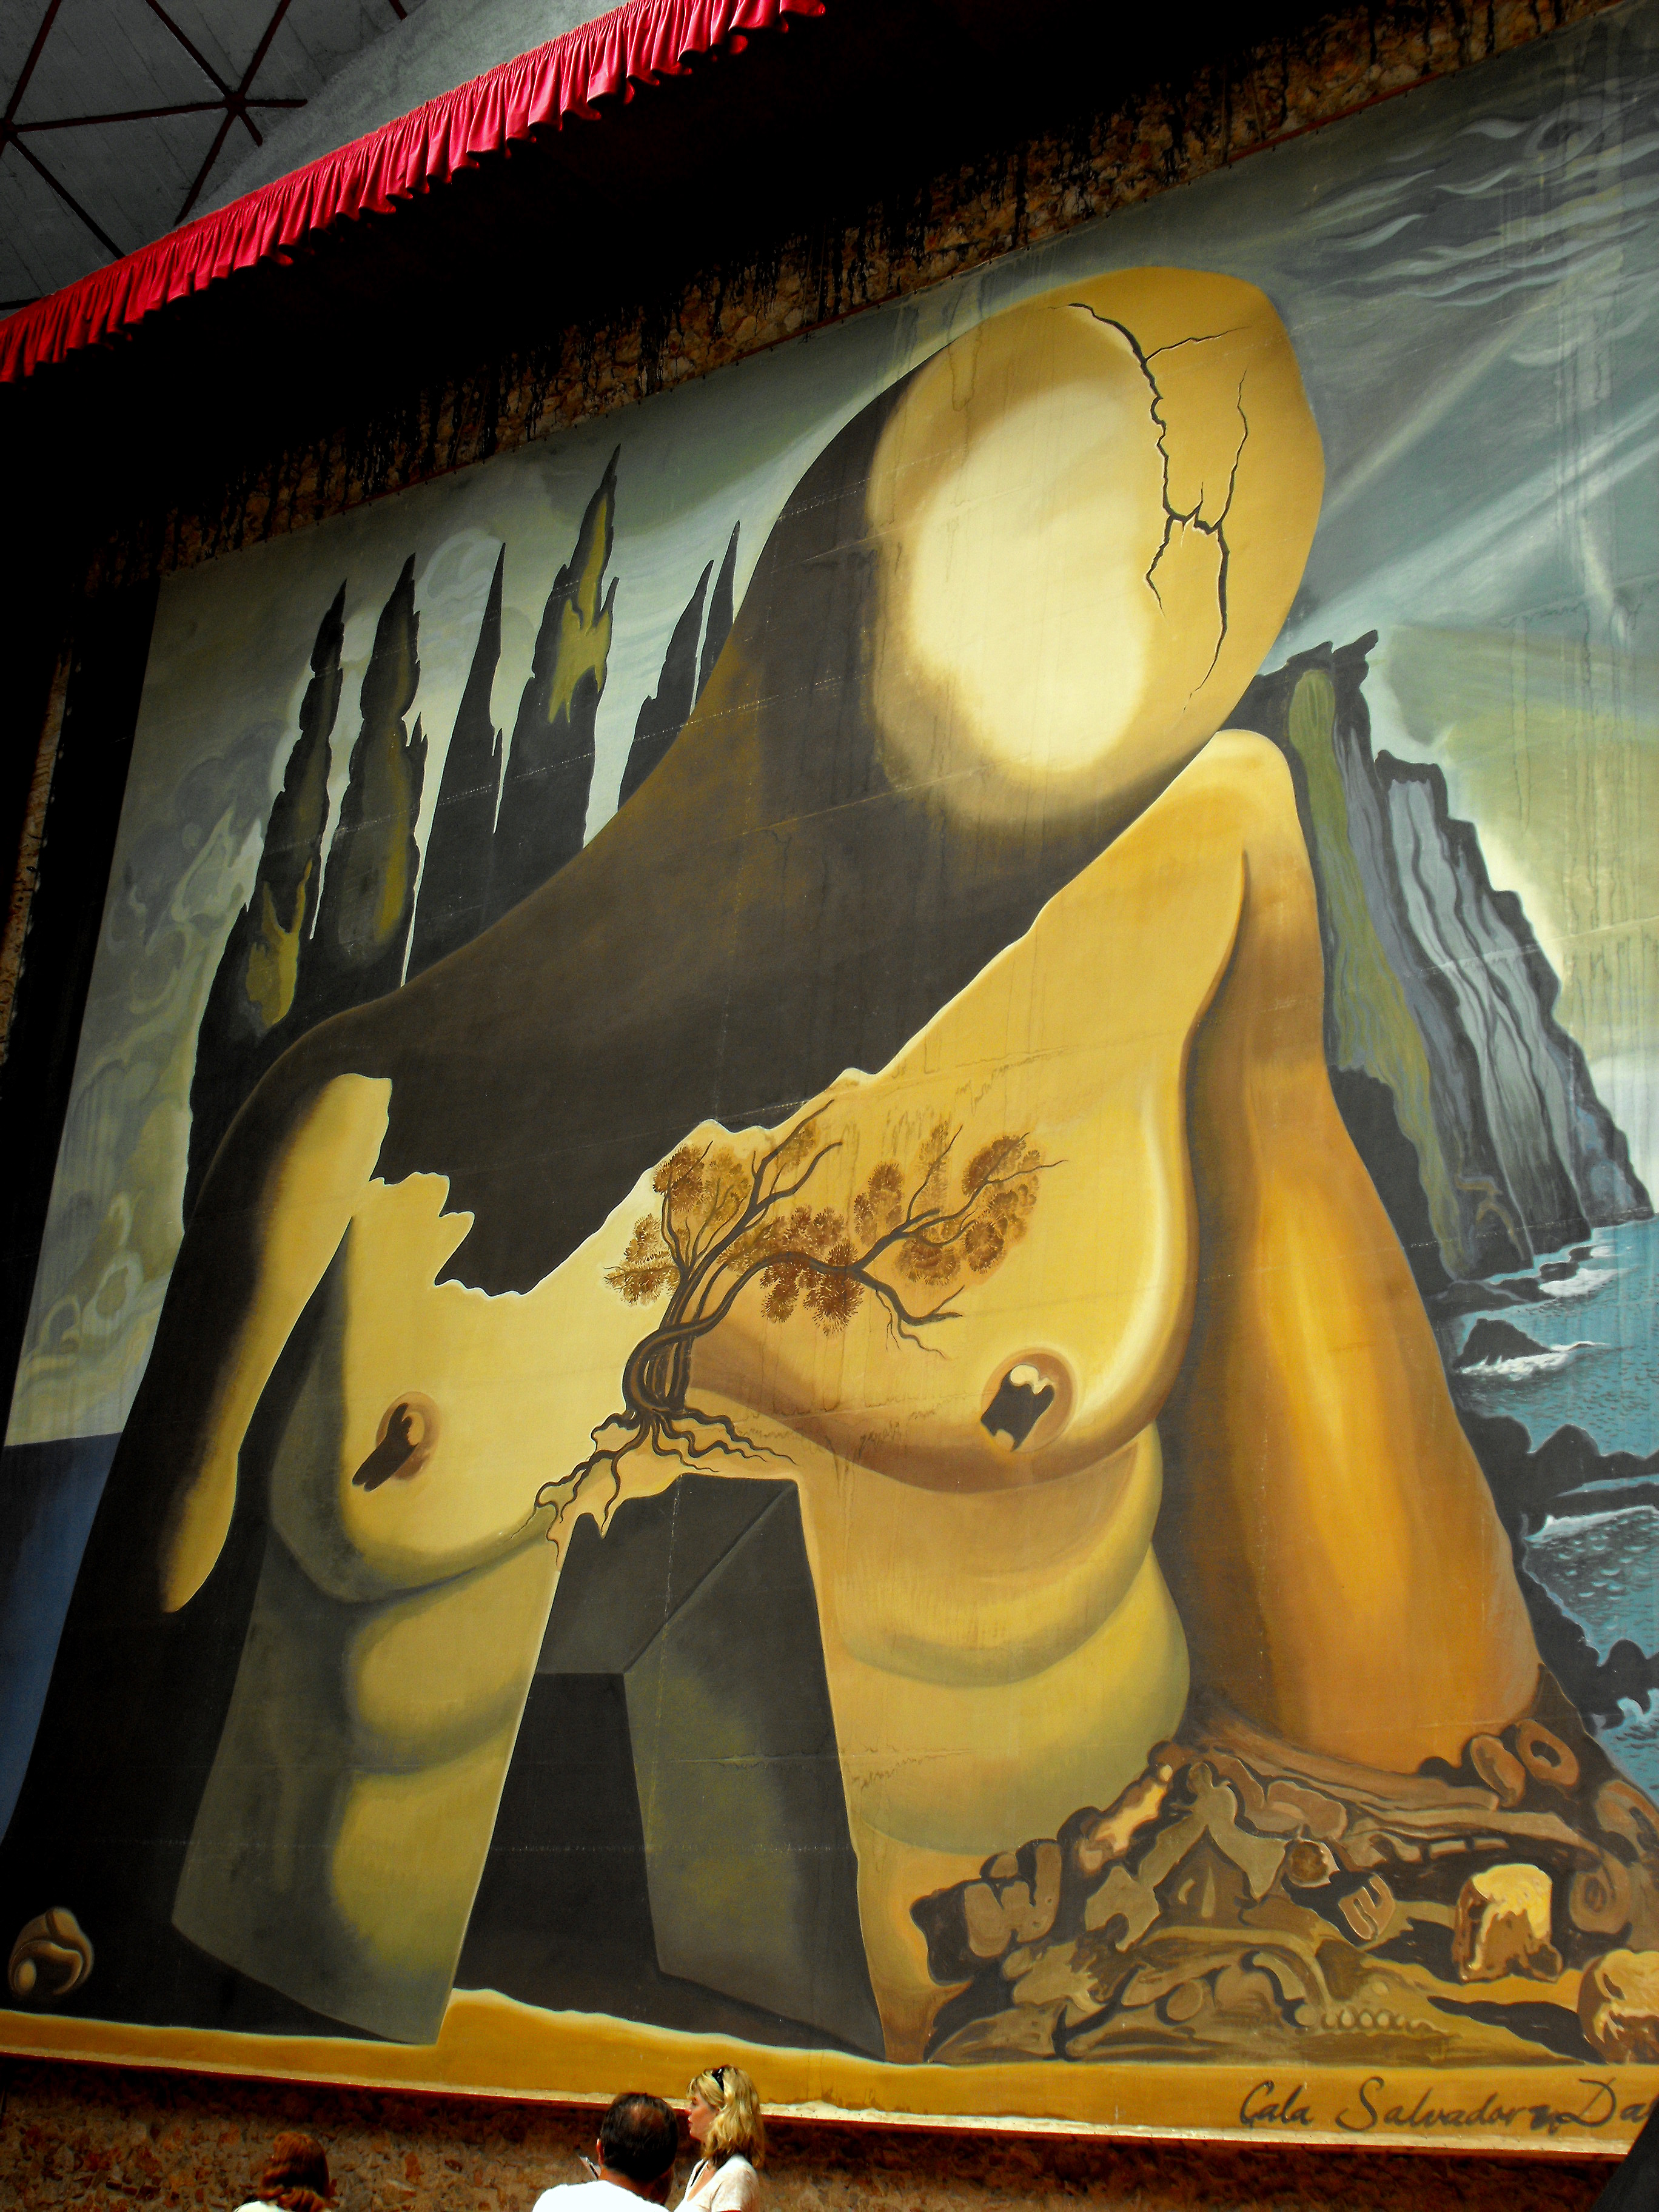 Salvador Dali – Figueres – Part Three | The Mind Travels